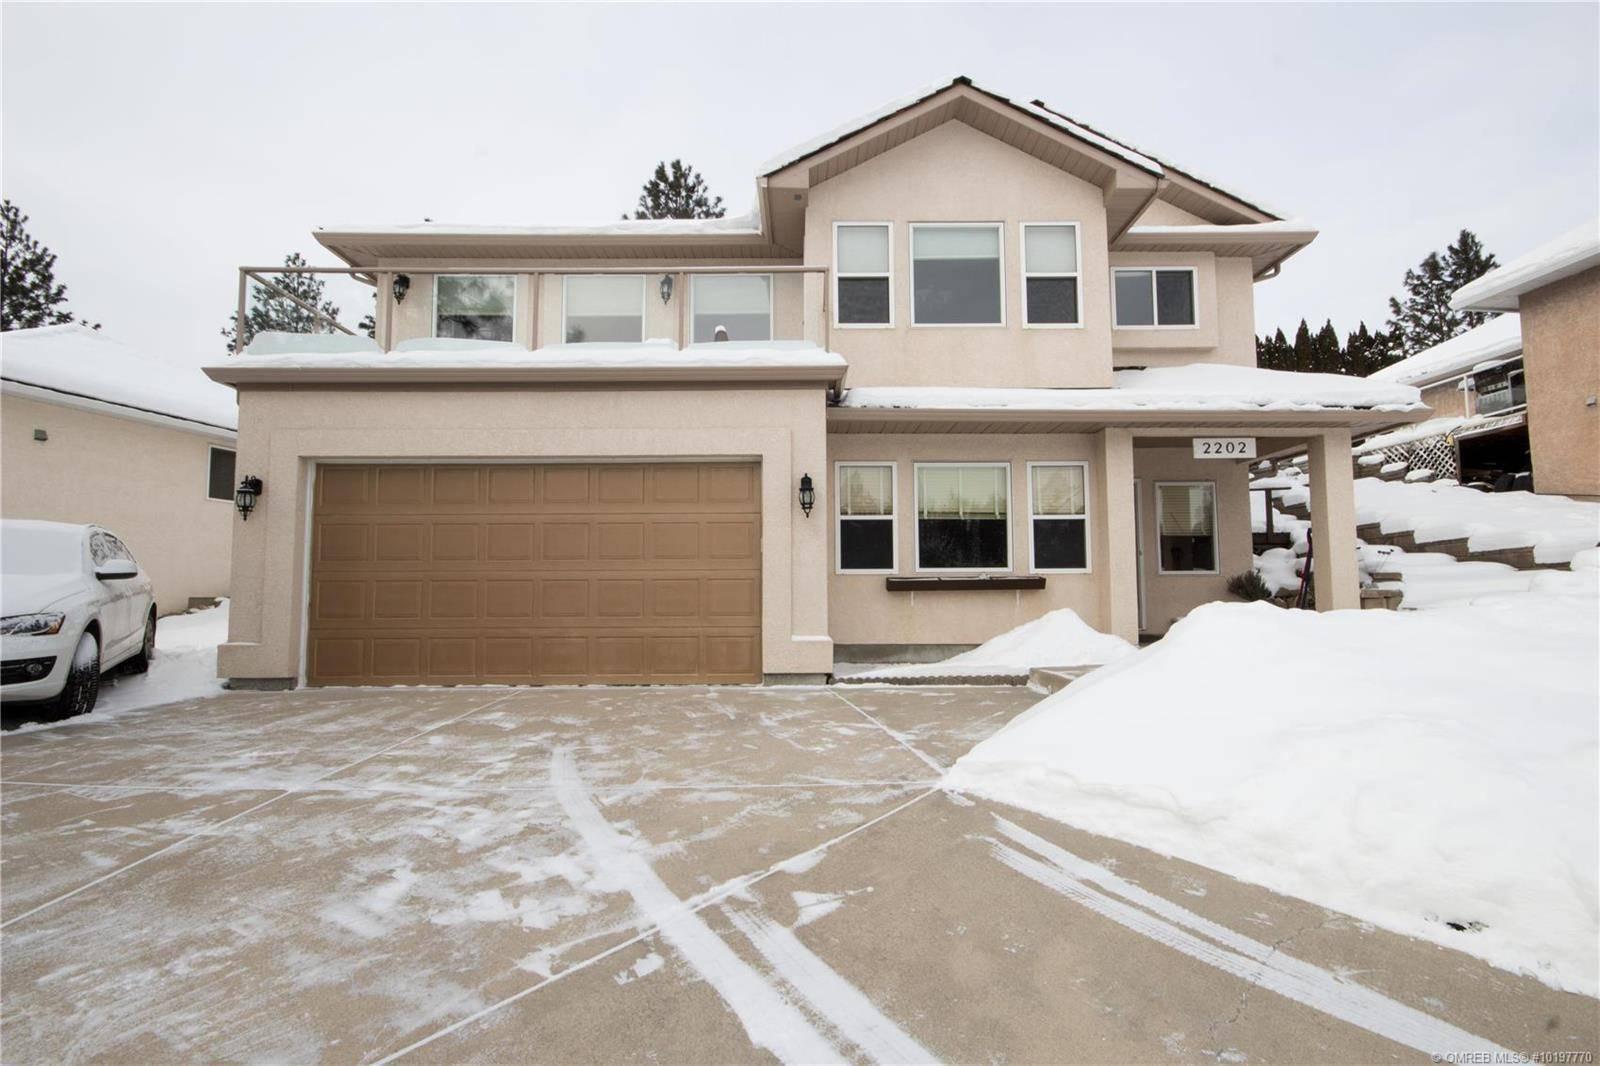 House for sale at 2202 Lillooet Cres Kelowna British Columbia - MLS: 10197770